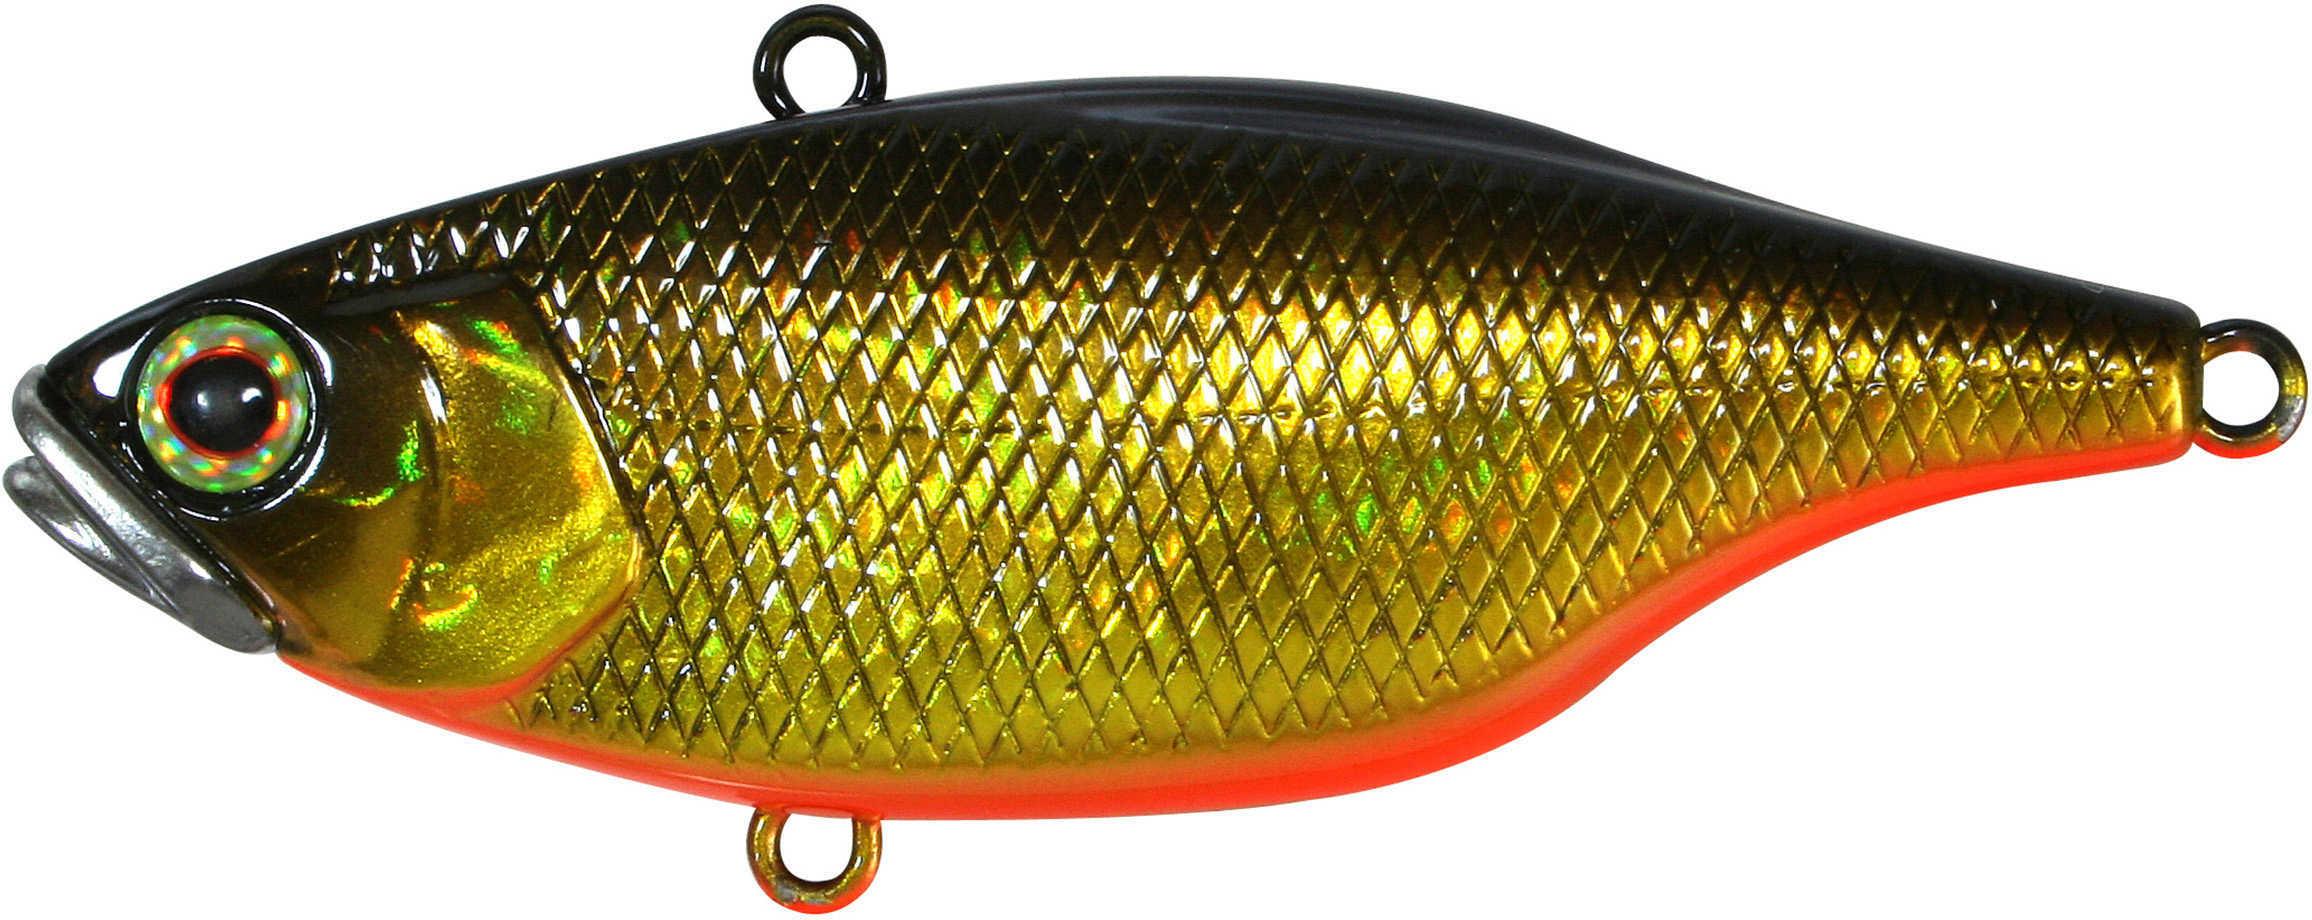 "Jackall Lures TN Lipless Crank Hard Bait Lure Model 60, 2.40"" Body Length, 4/9 oz HI Black and Gold, Per 1 Md: JTN60-HLB"